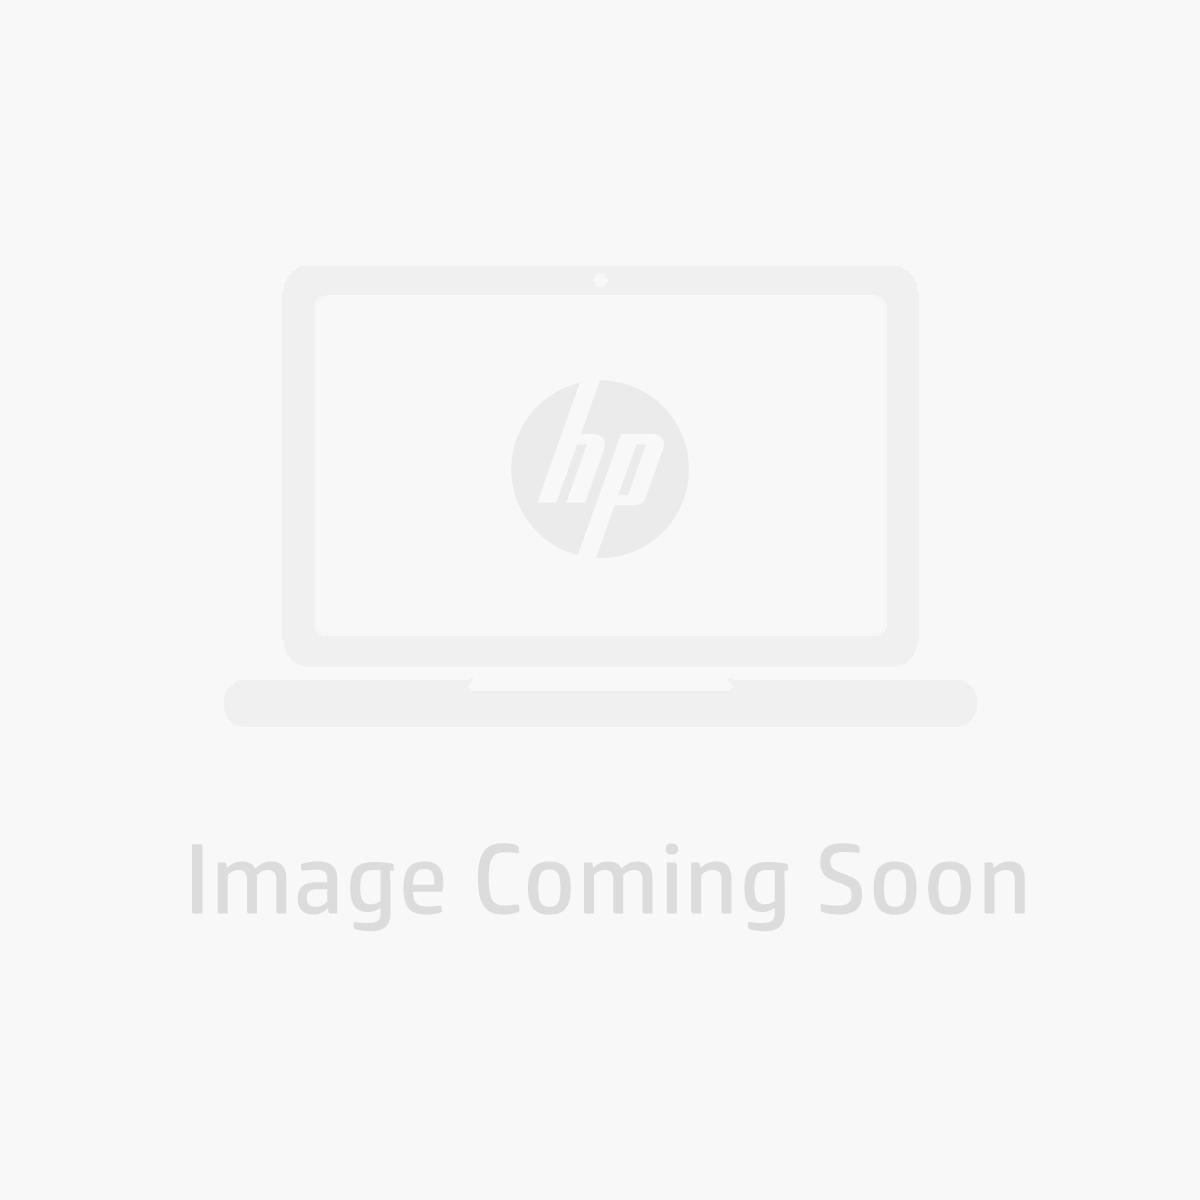 HP Pavilion Gaming Desktop i5-8400 with NVIDIA® GeForce® GTX 1050Ti